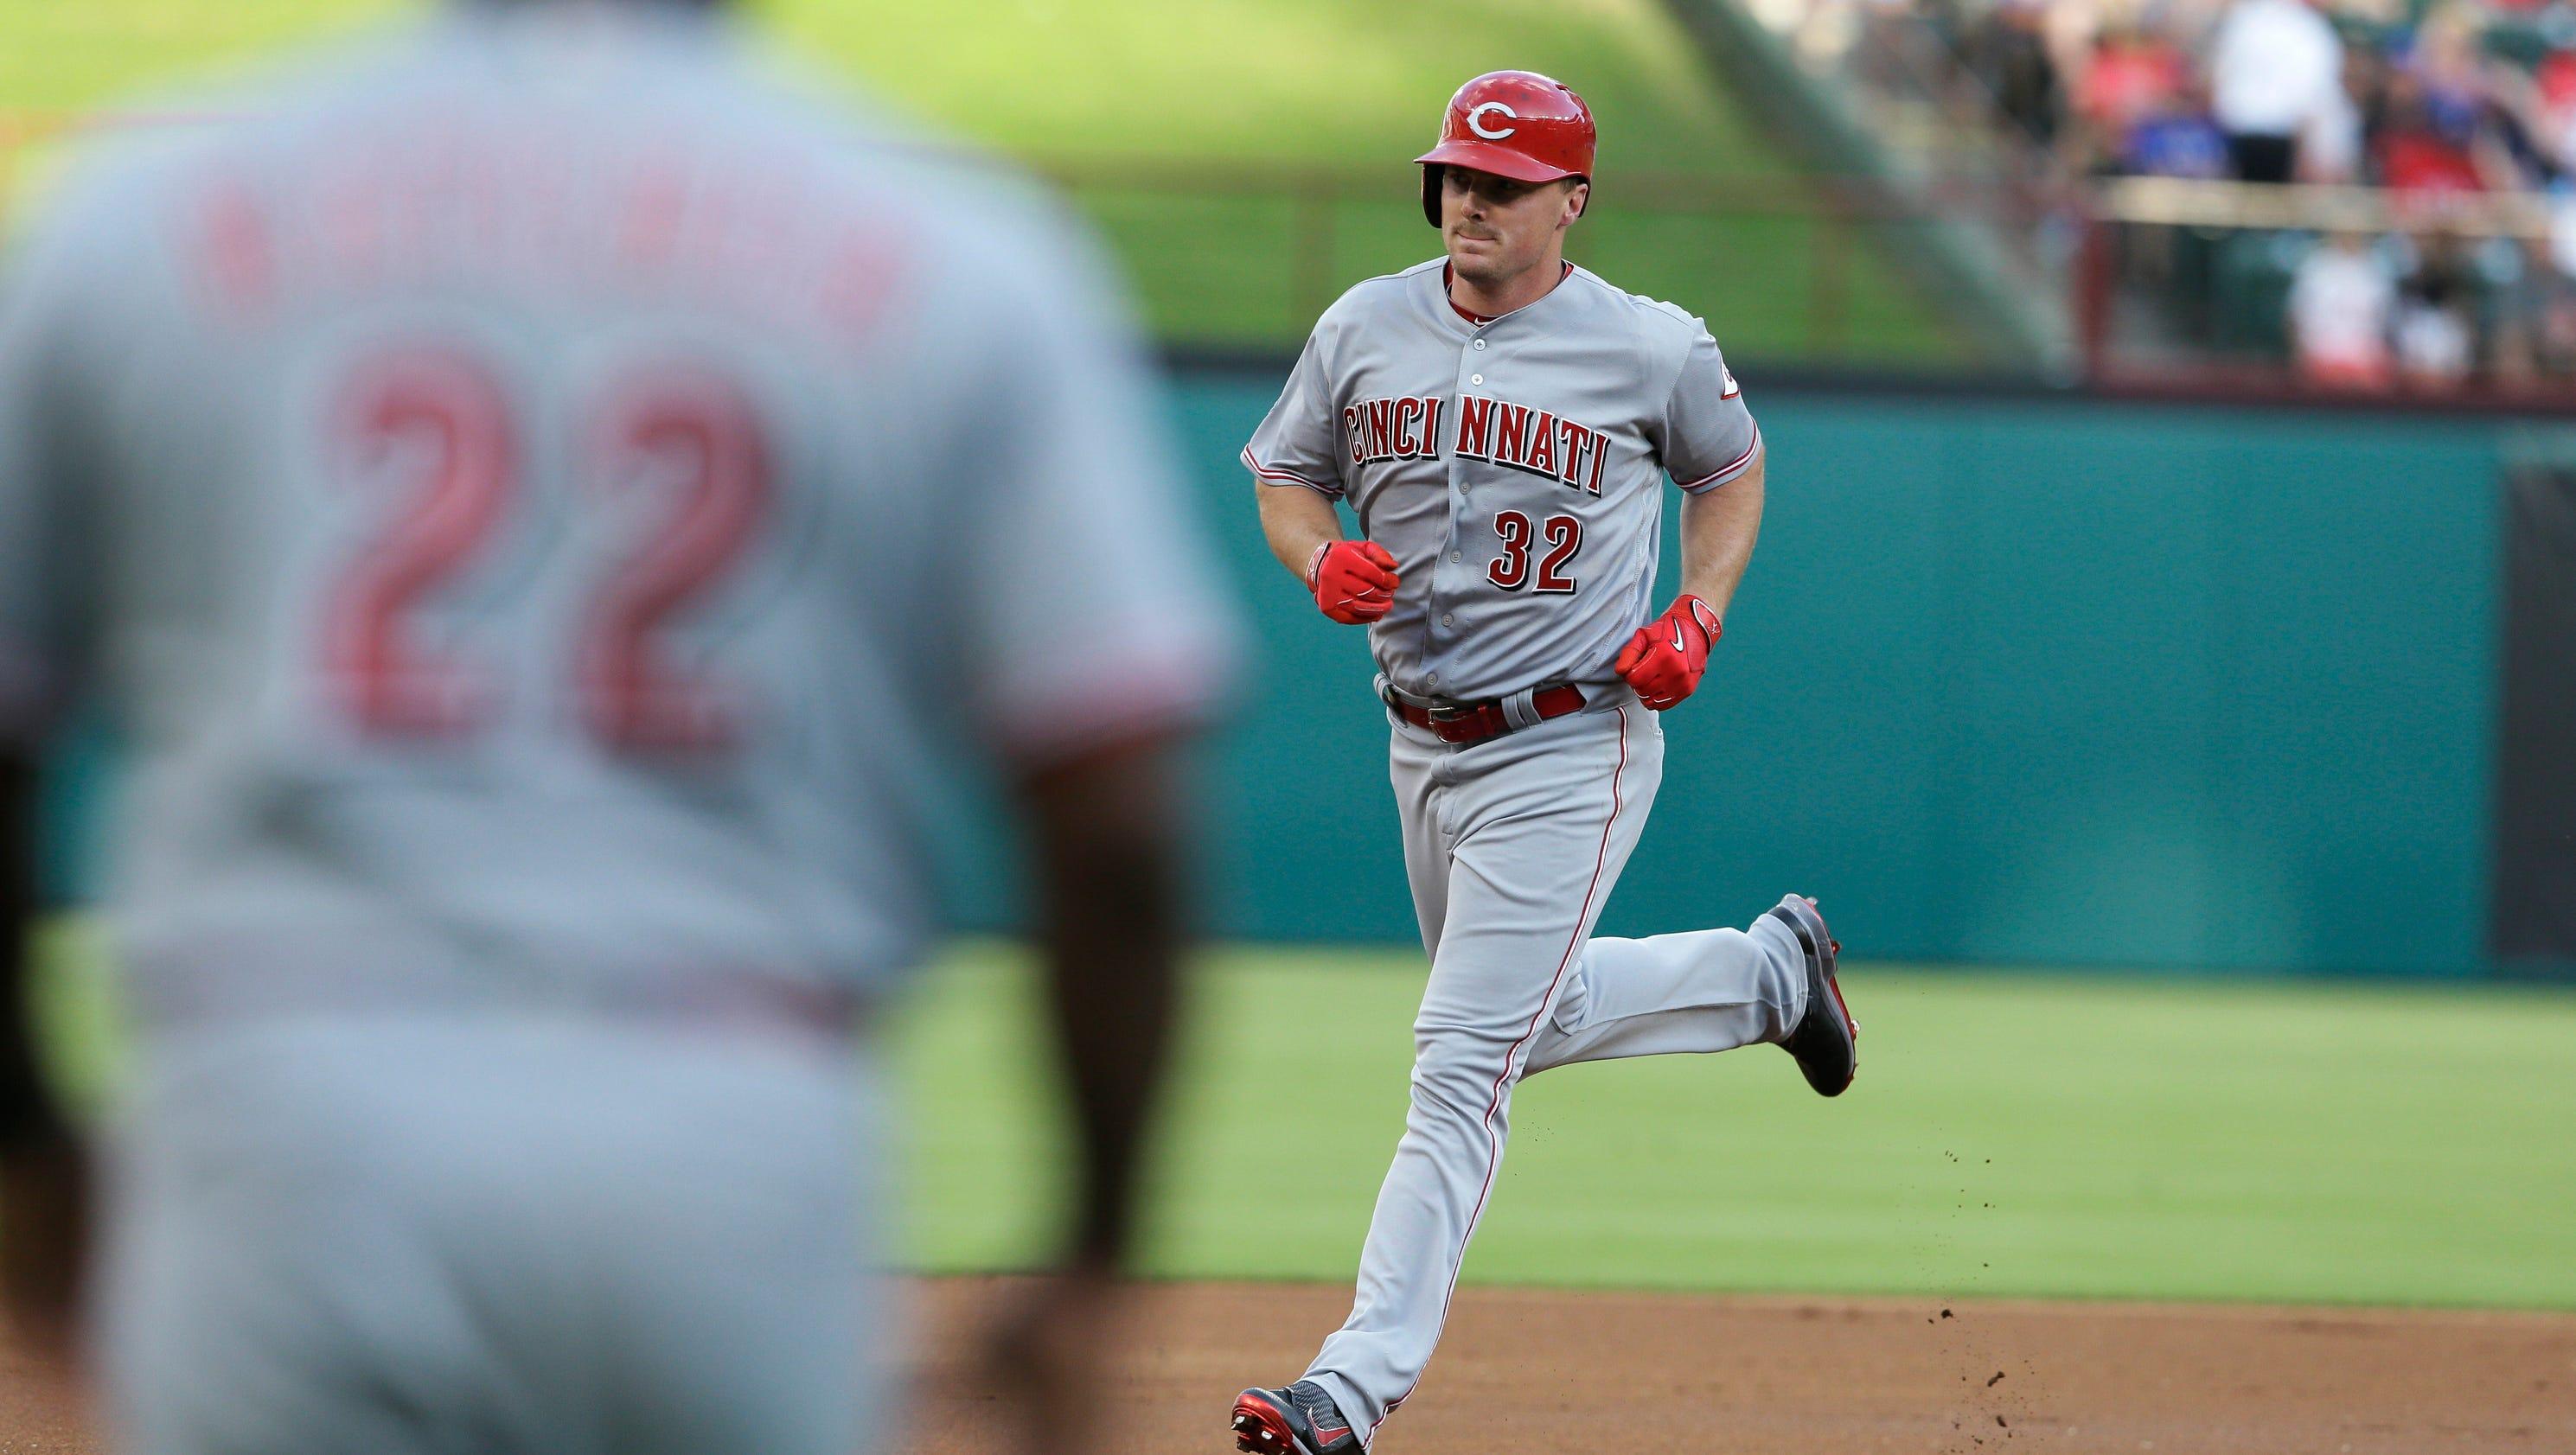 636021447297996300-reds-rangers-baseball-ablumer-cincinnati.com-1-6-